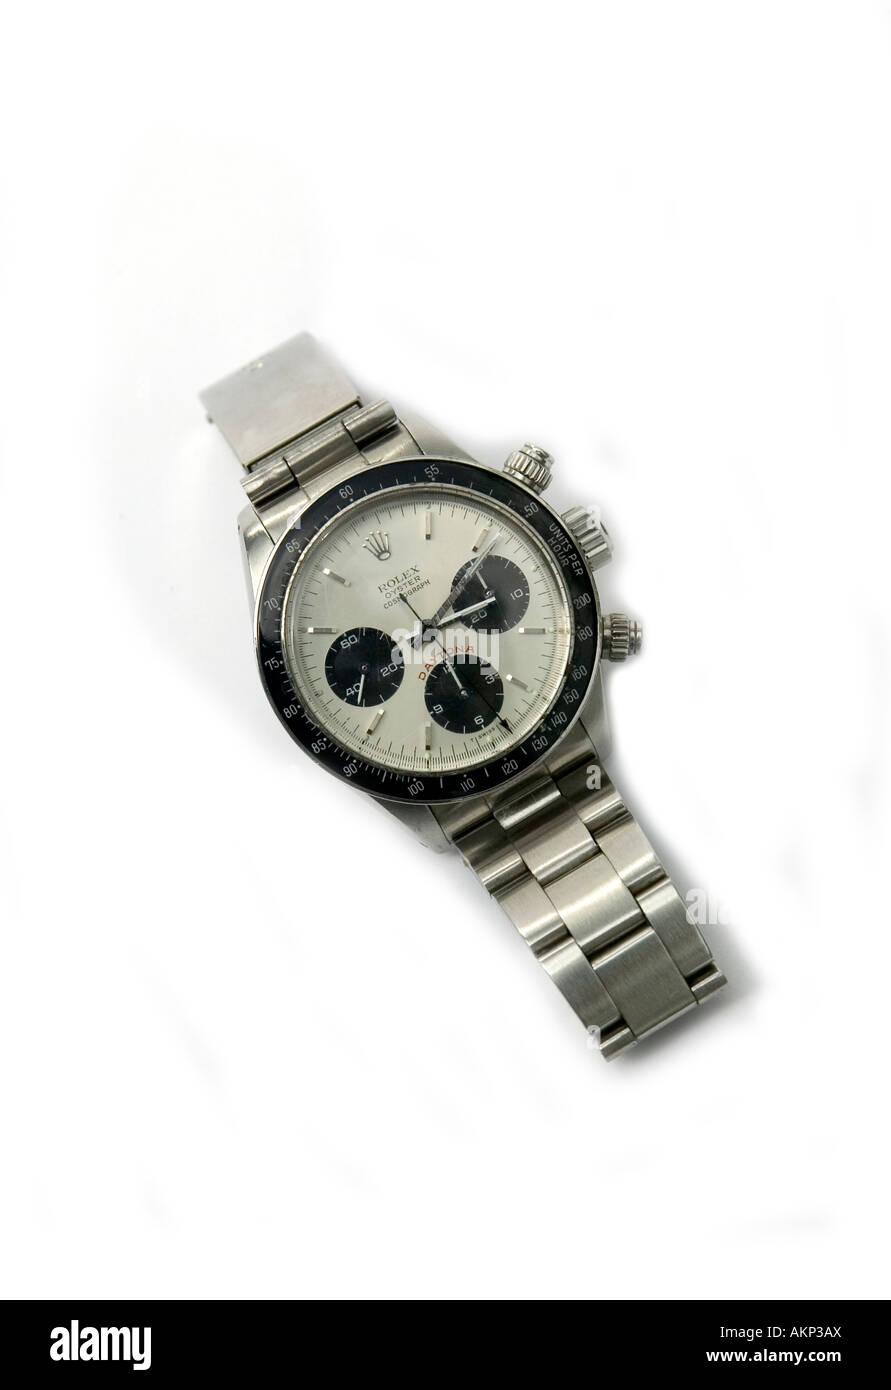 Rolex Daytona Chronograph - Stock Image